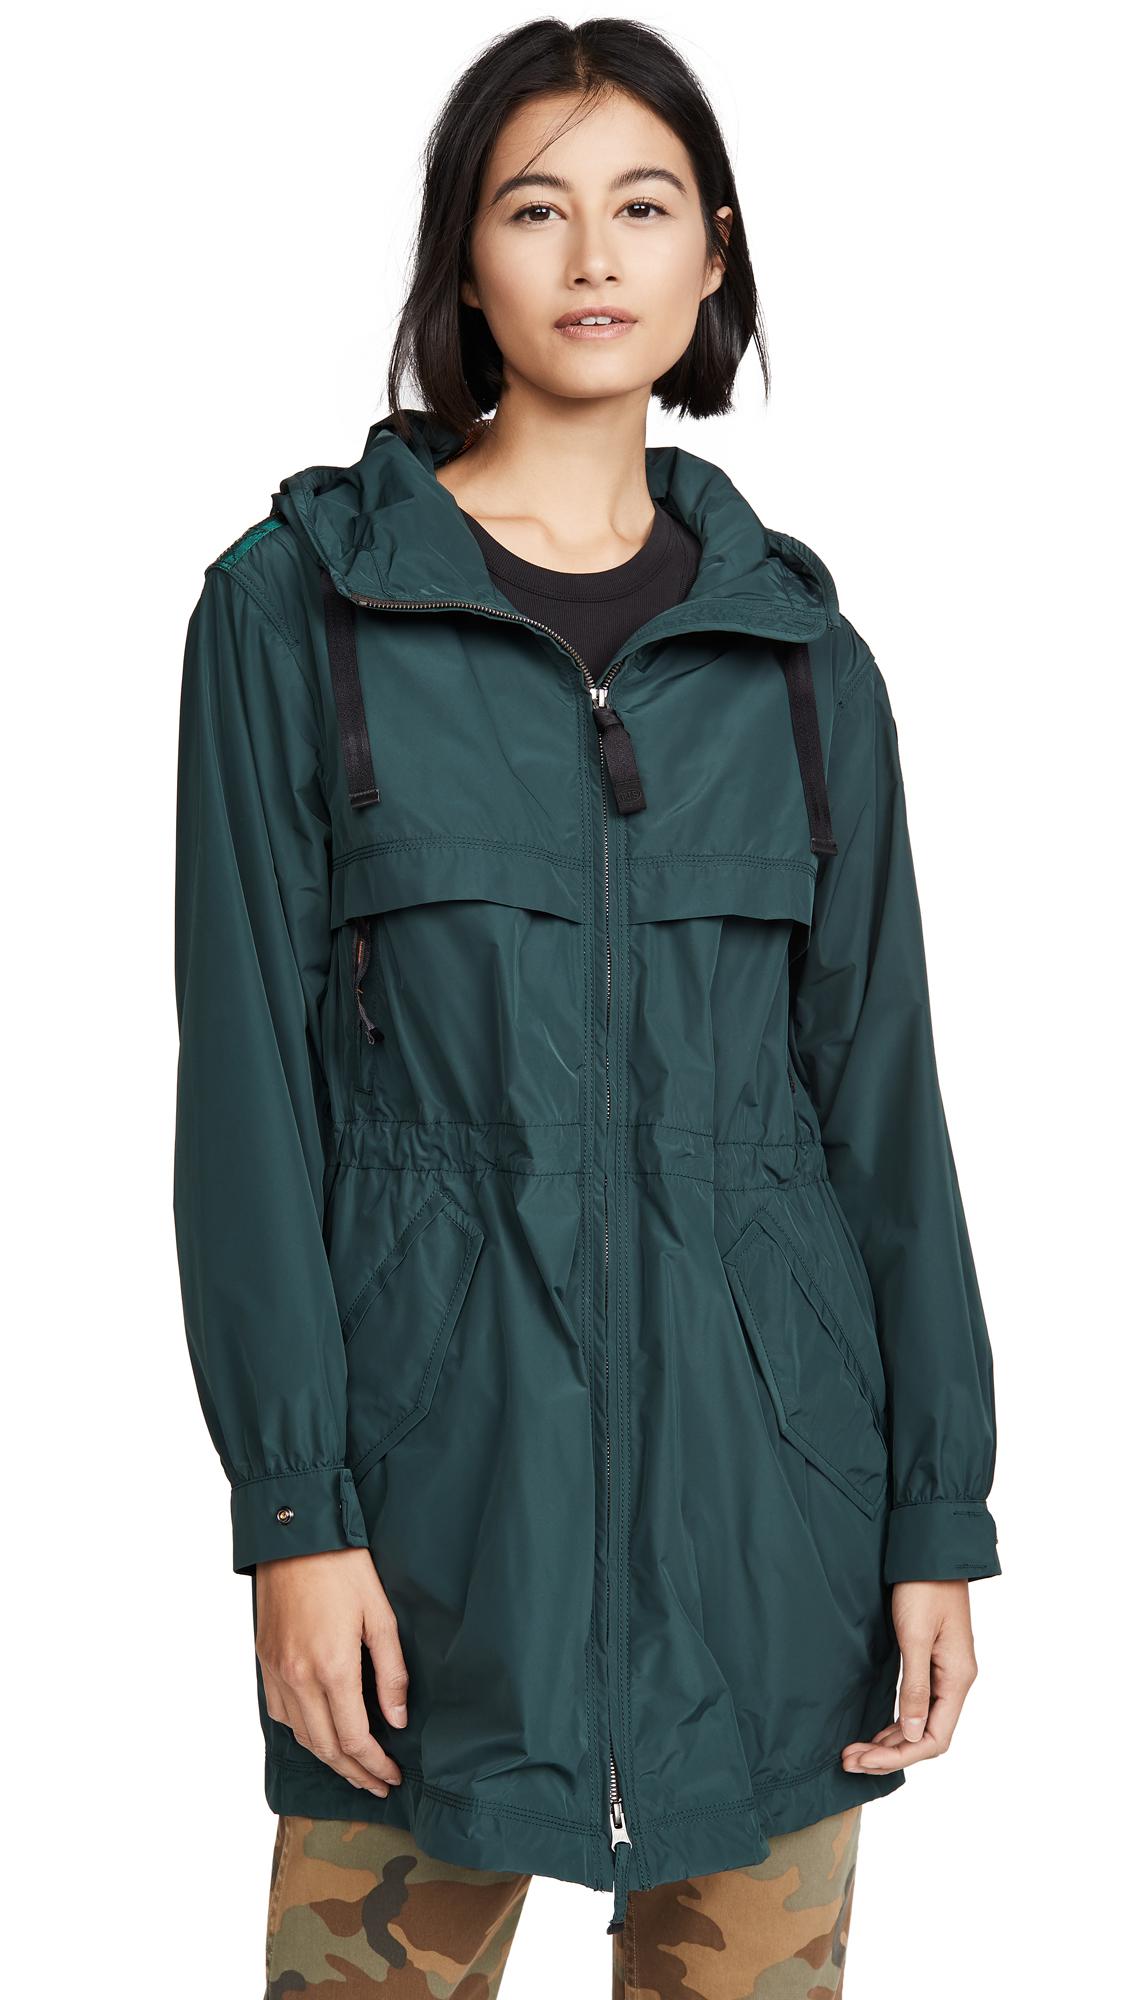 Buy Parajumpers Sands Jacket online beautiful Parajumpers Jackets, Coats, Trench Coats